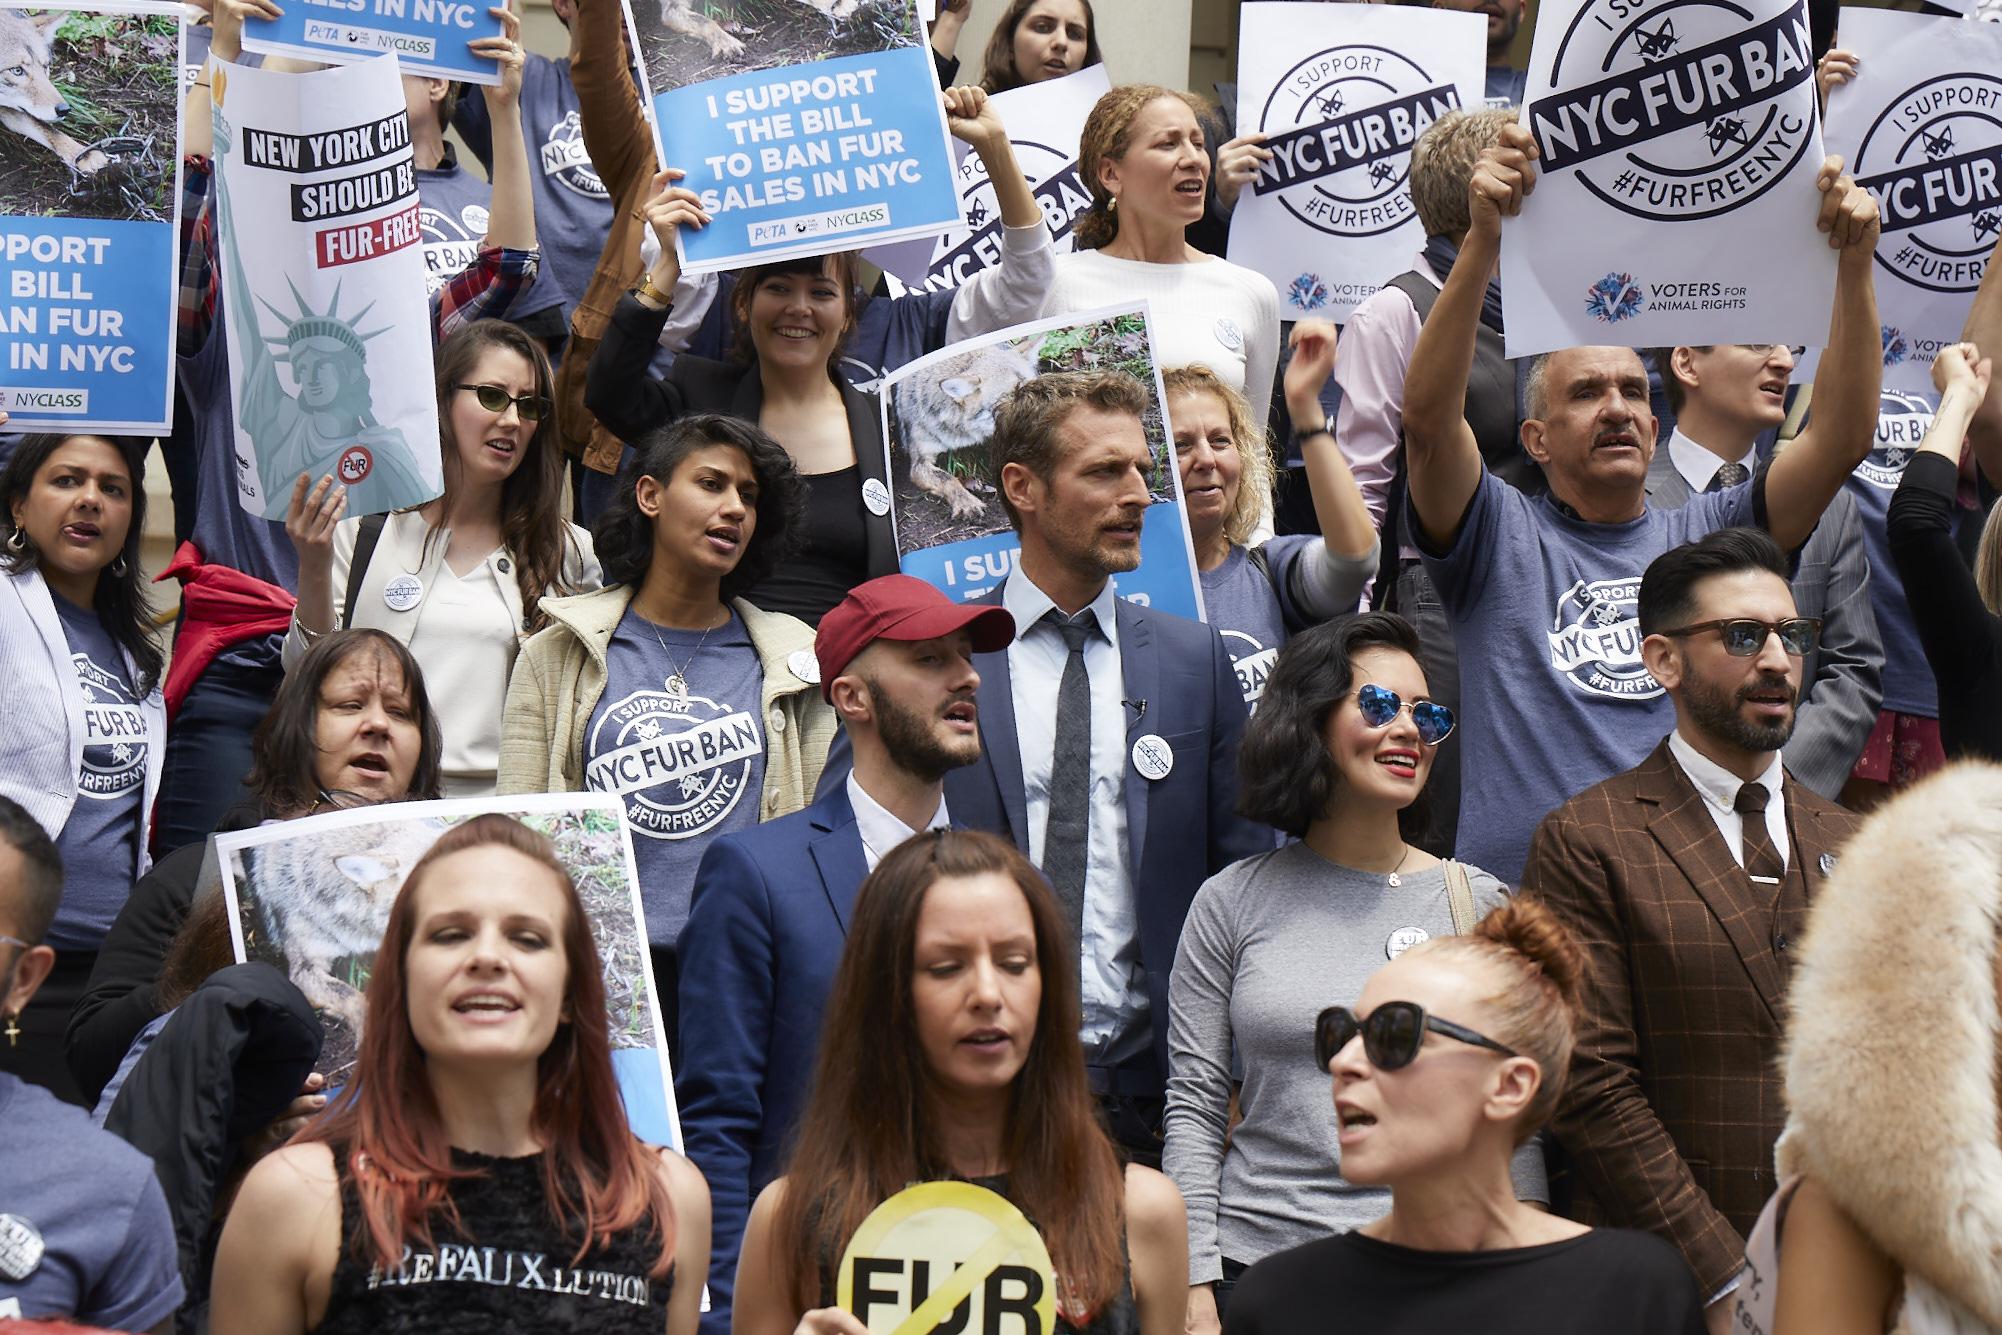 NYC Fur Ban march.